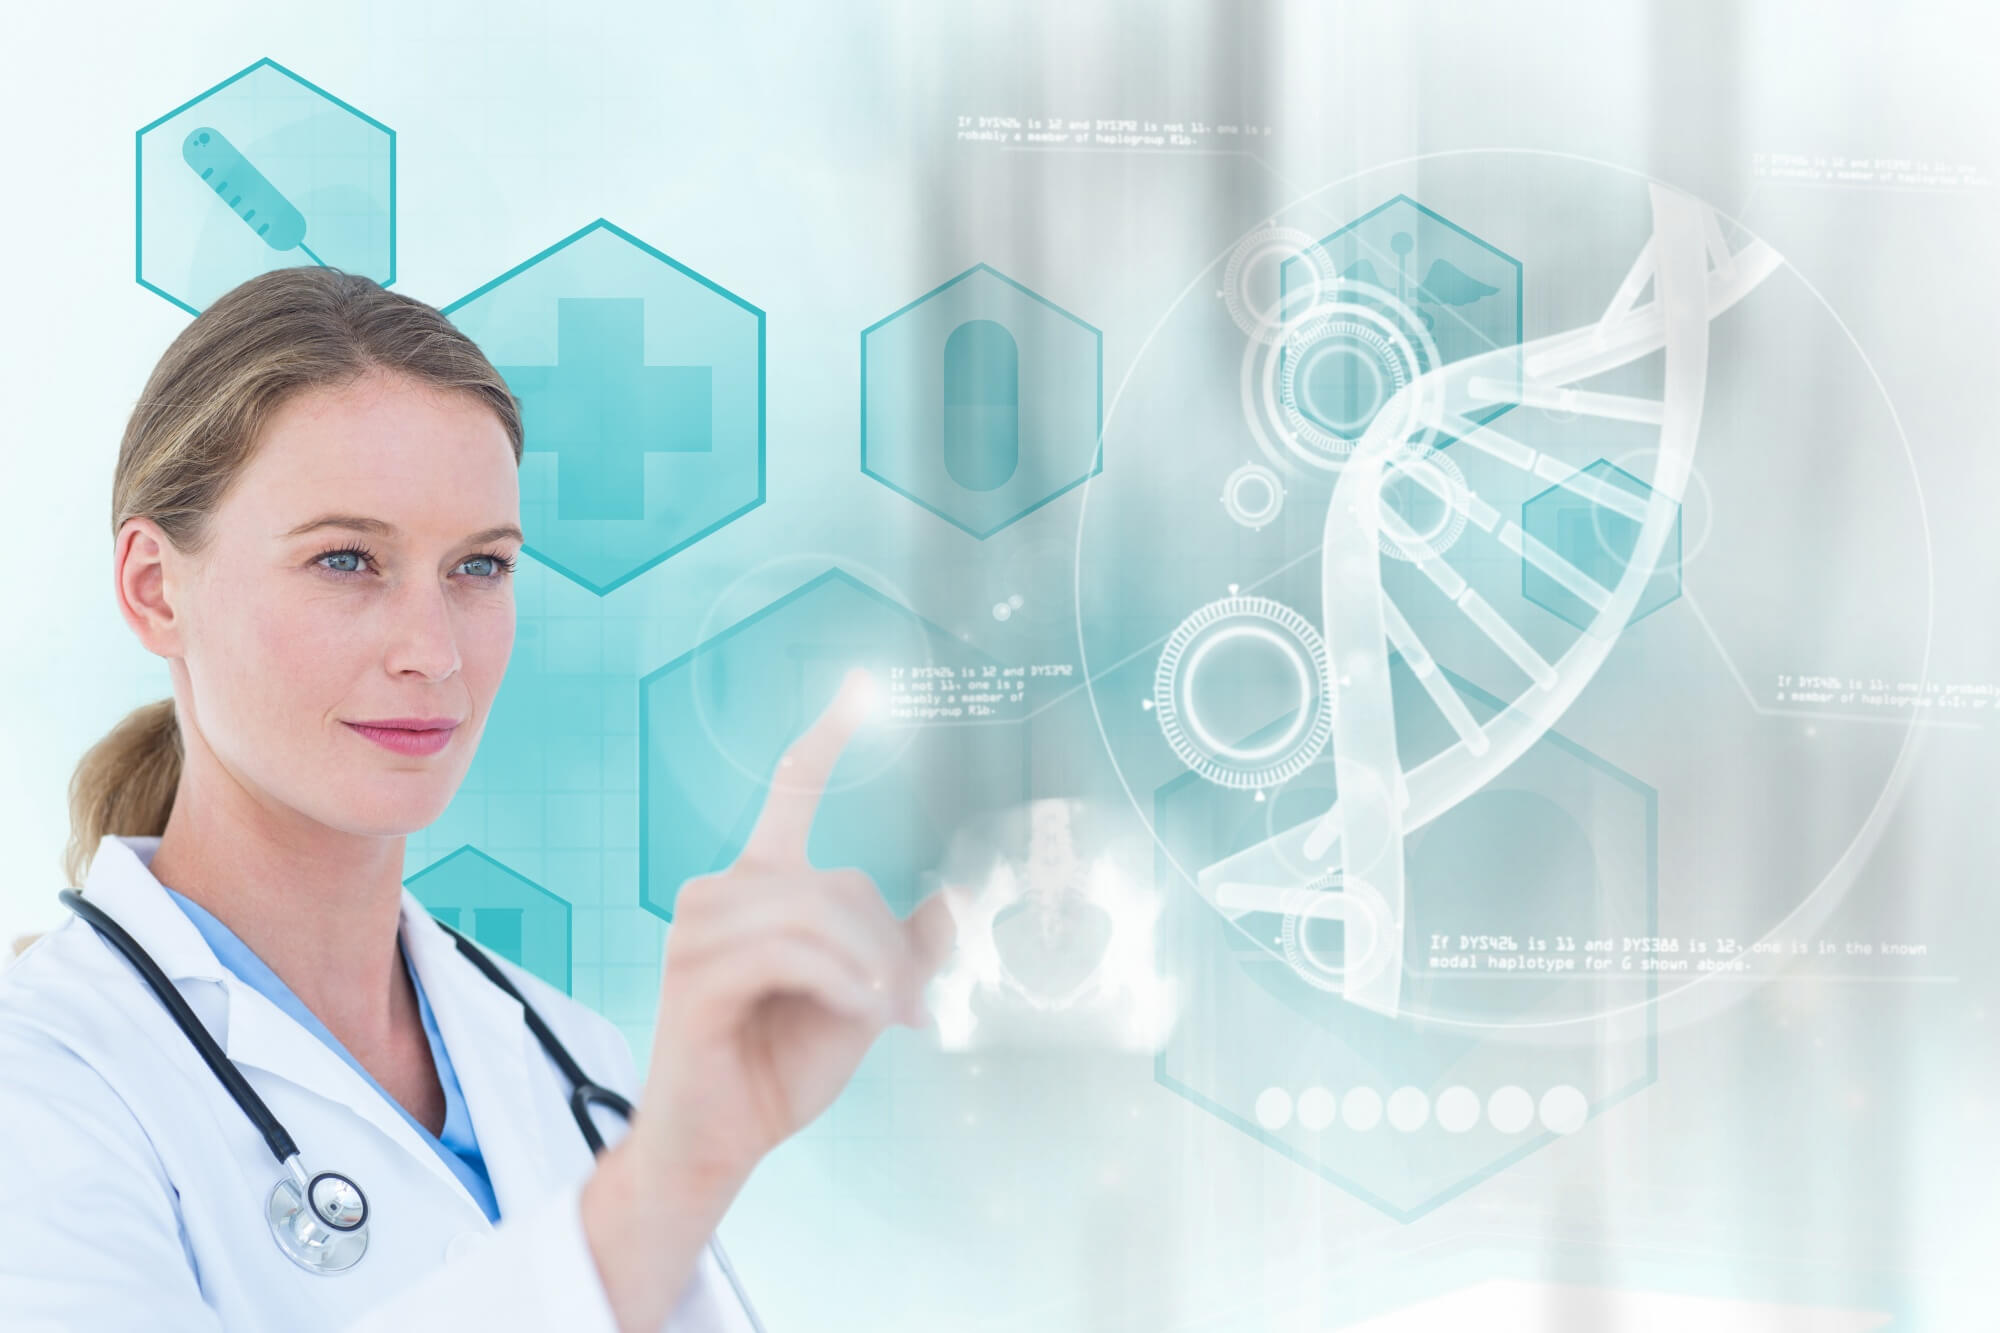 https://www.freepik.es/fotos/medico'>Foto de Médico creado por kjpargeter - www.freepik.es